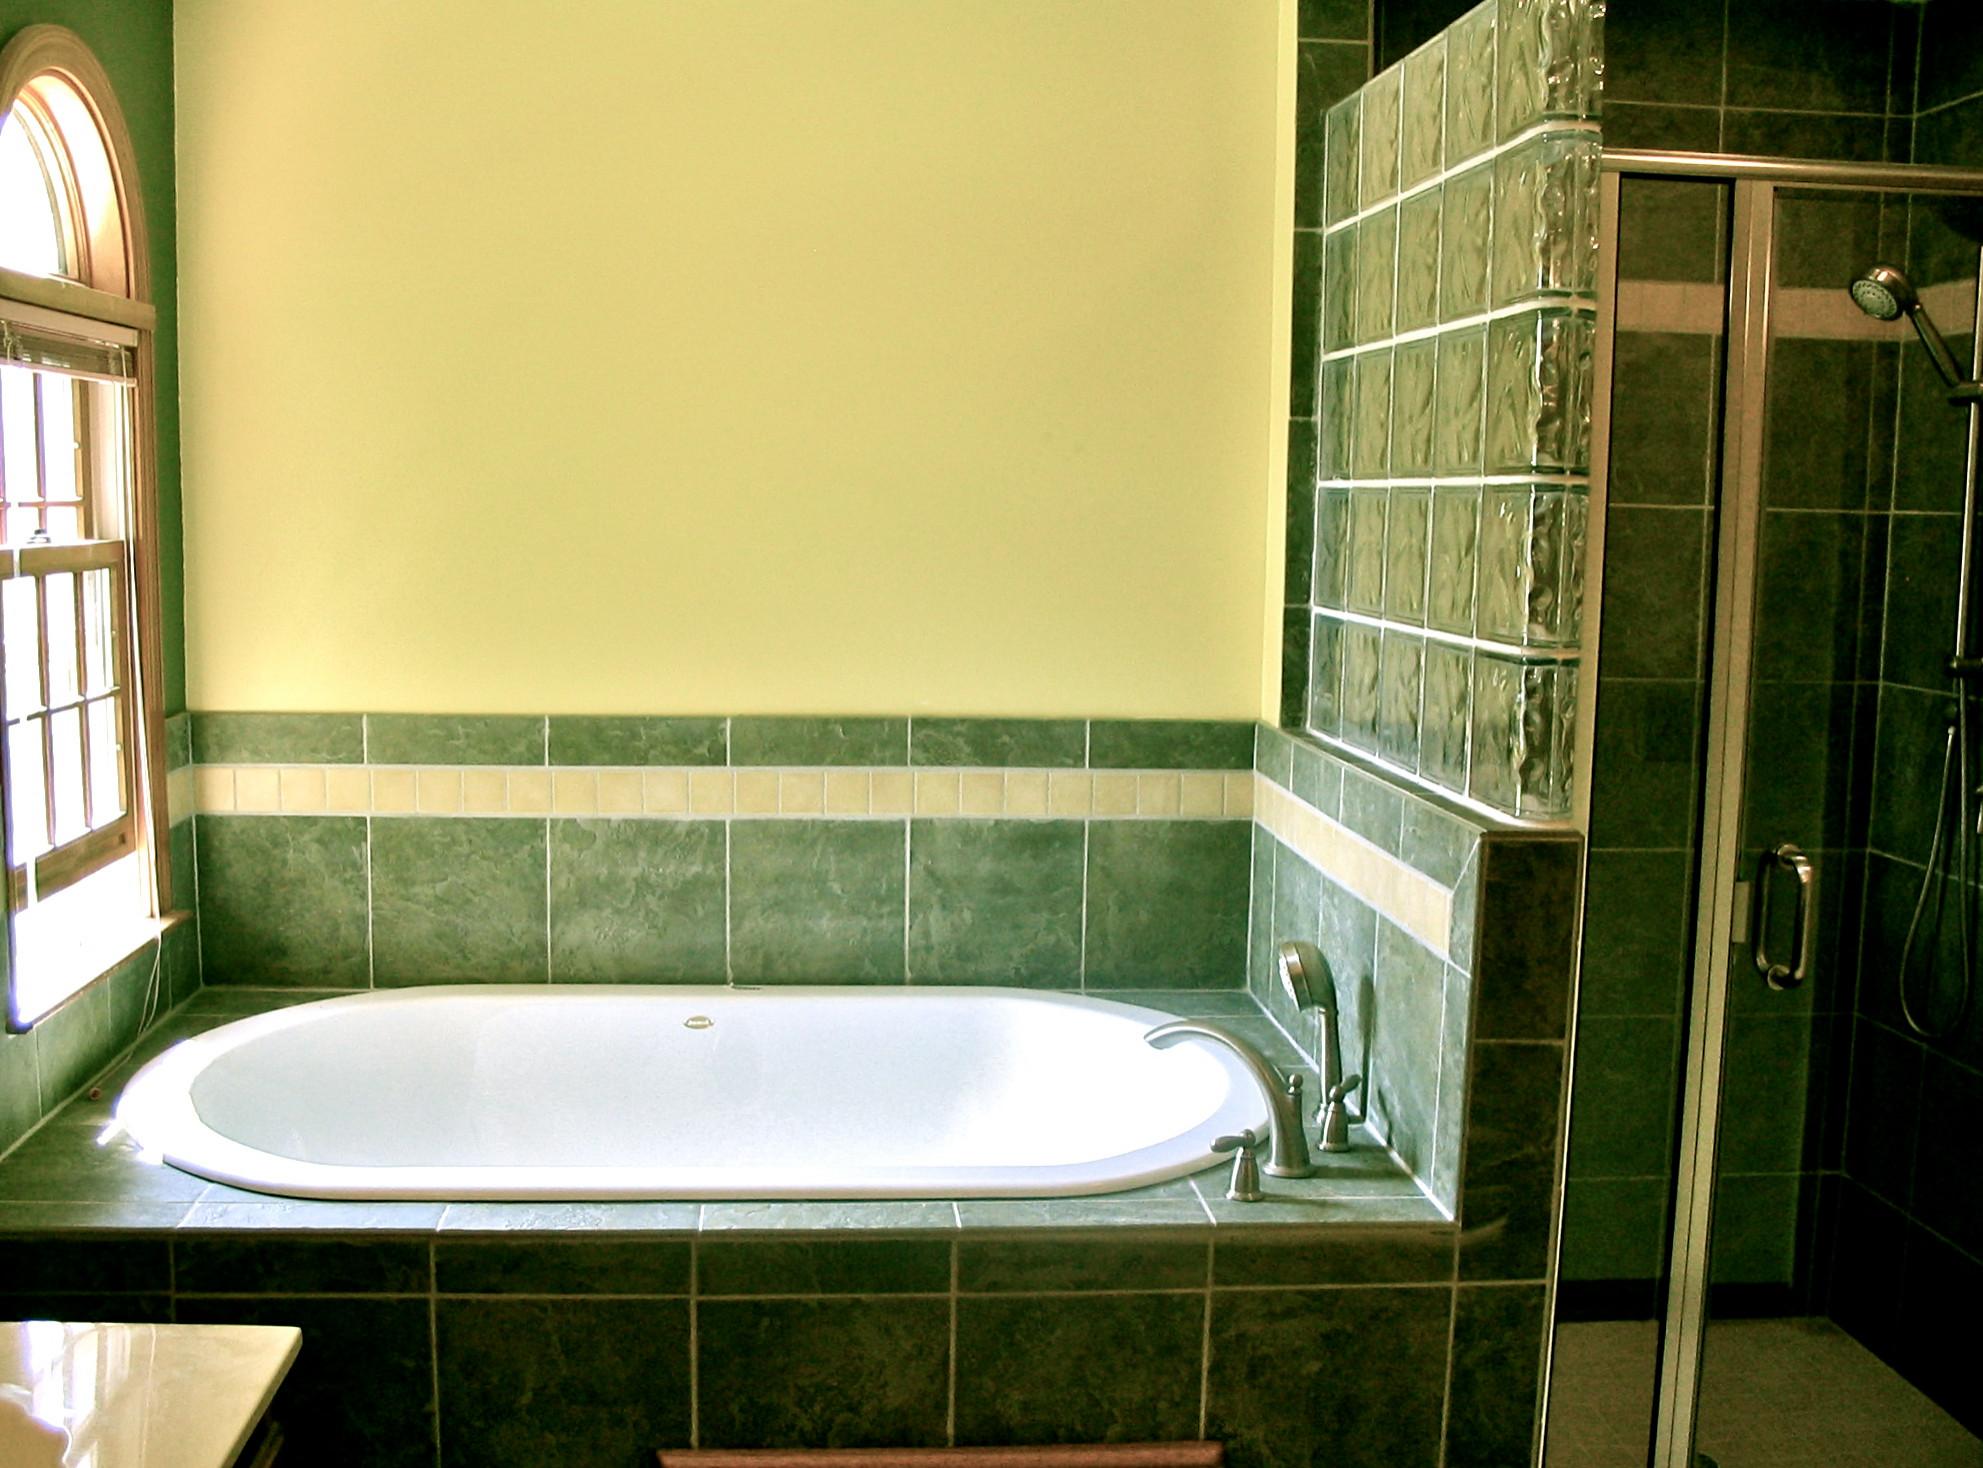 Renaissance Custom Bathrooms